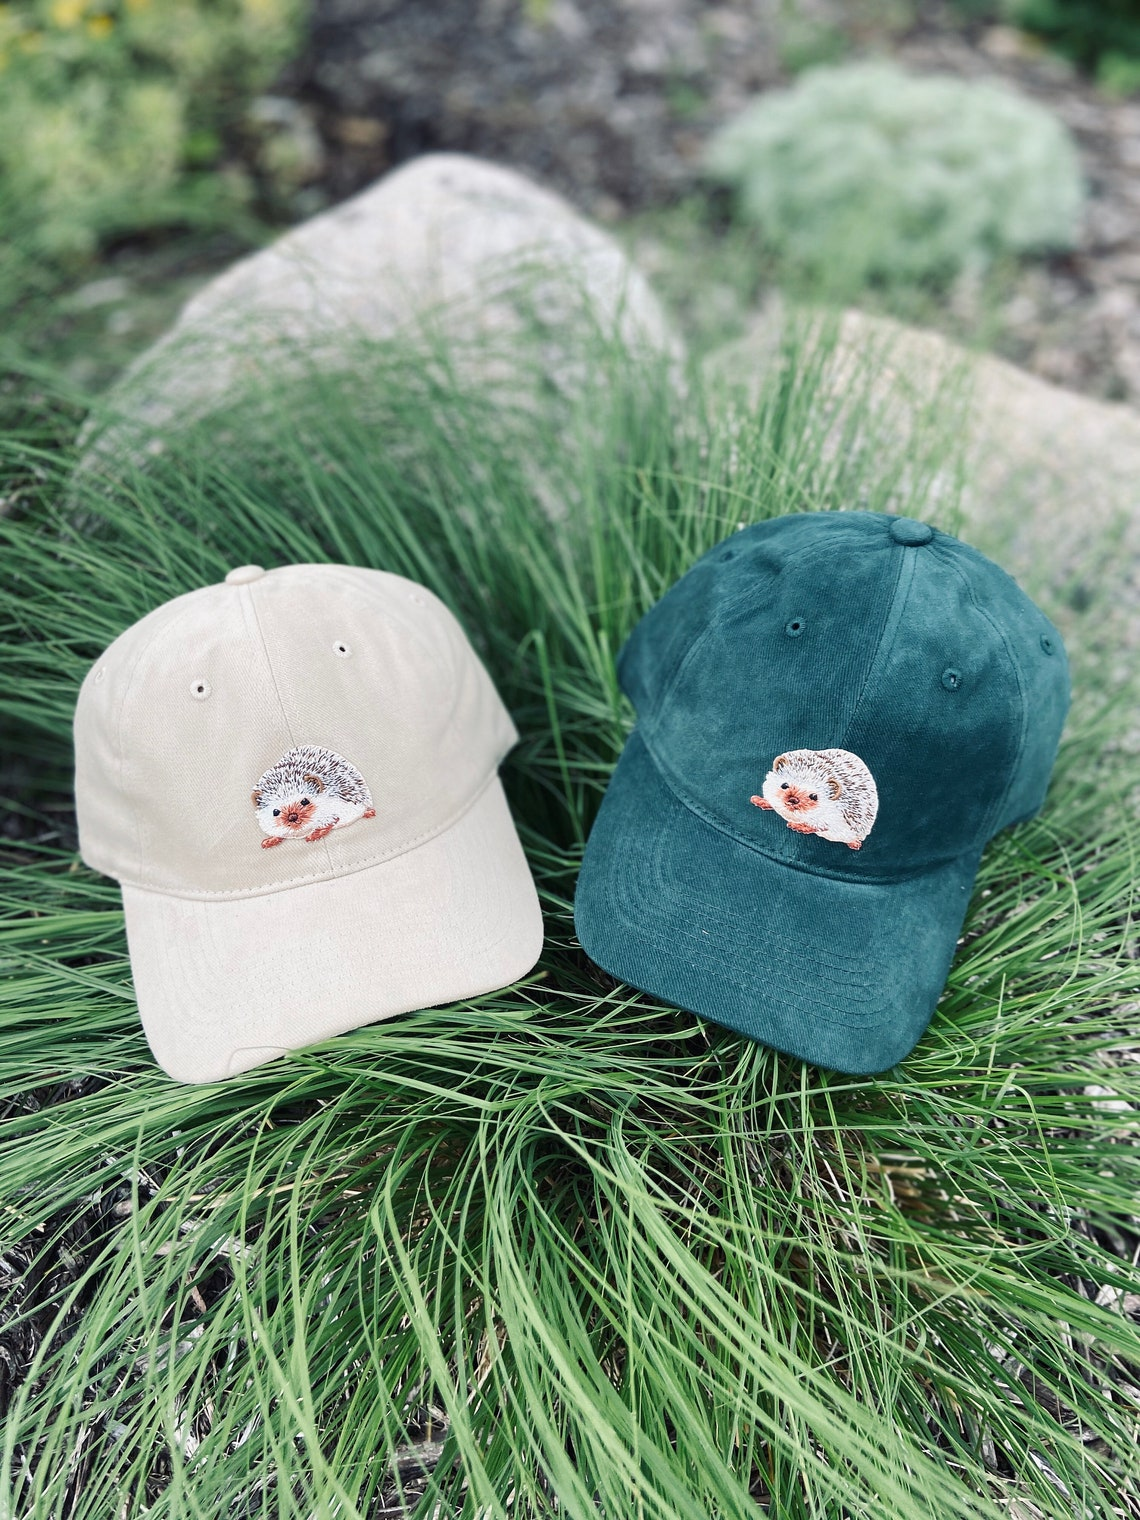 5. Hedgehog Hat